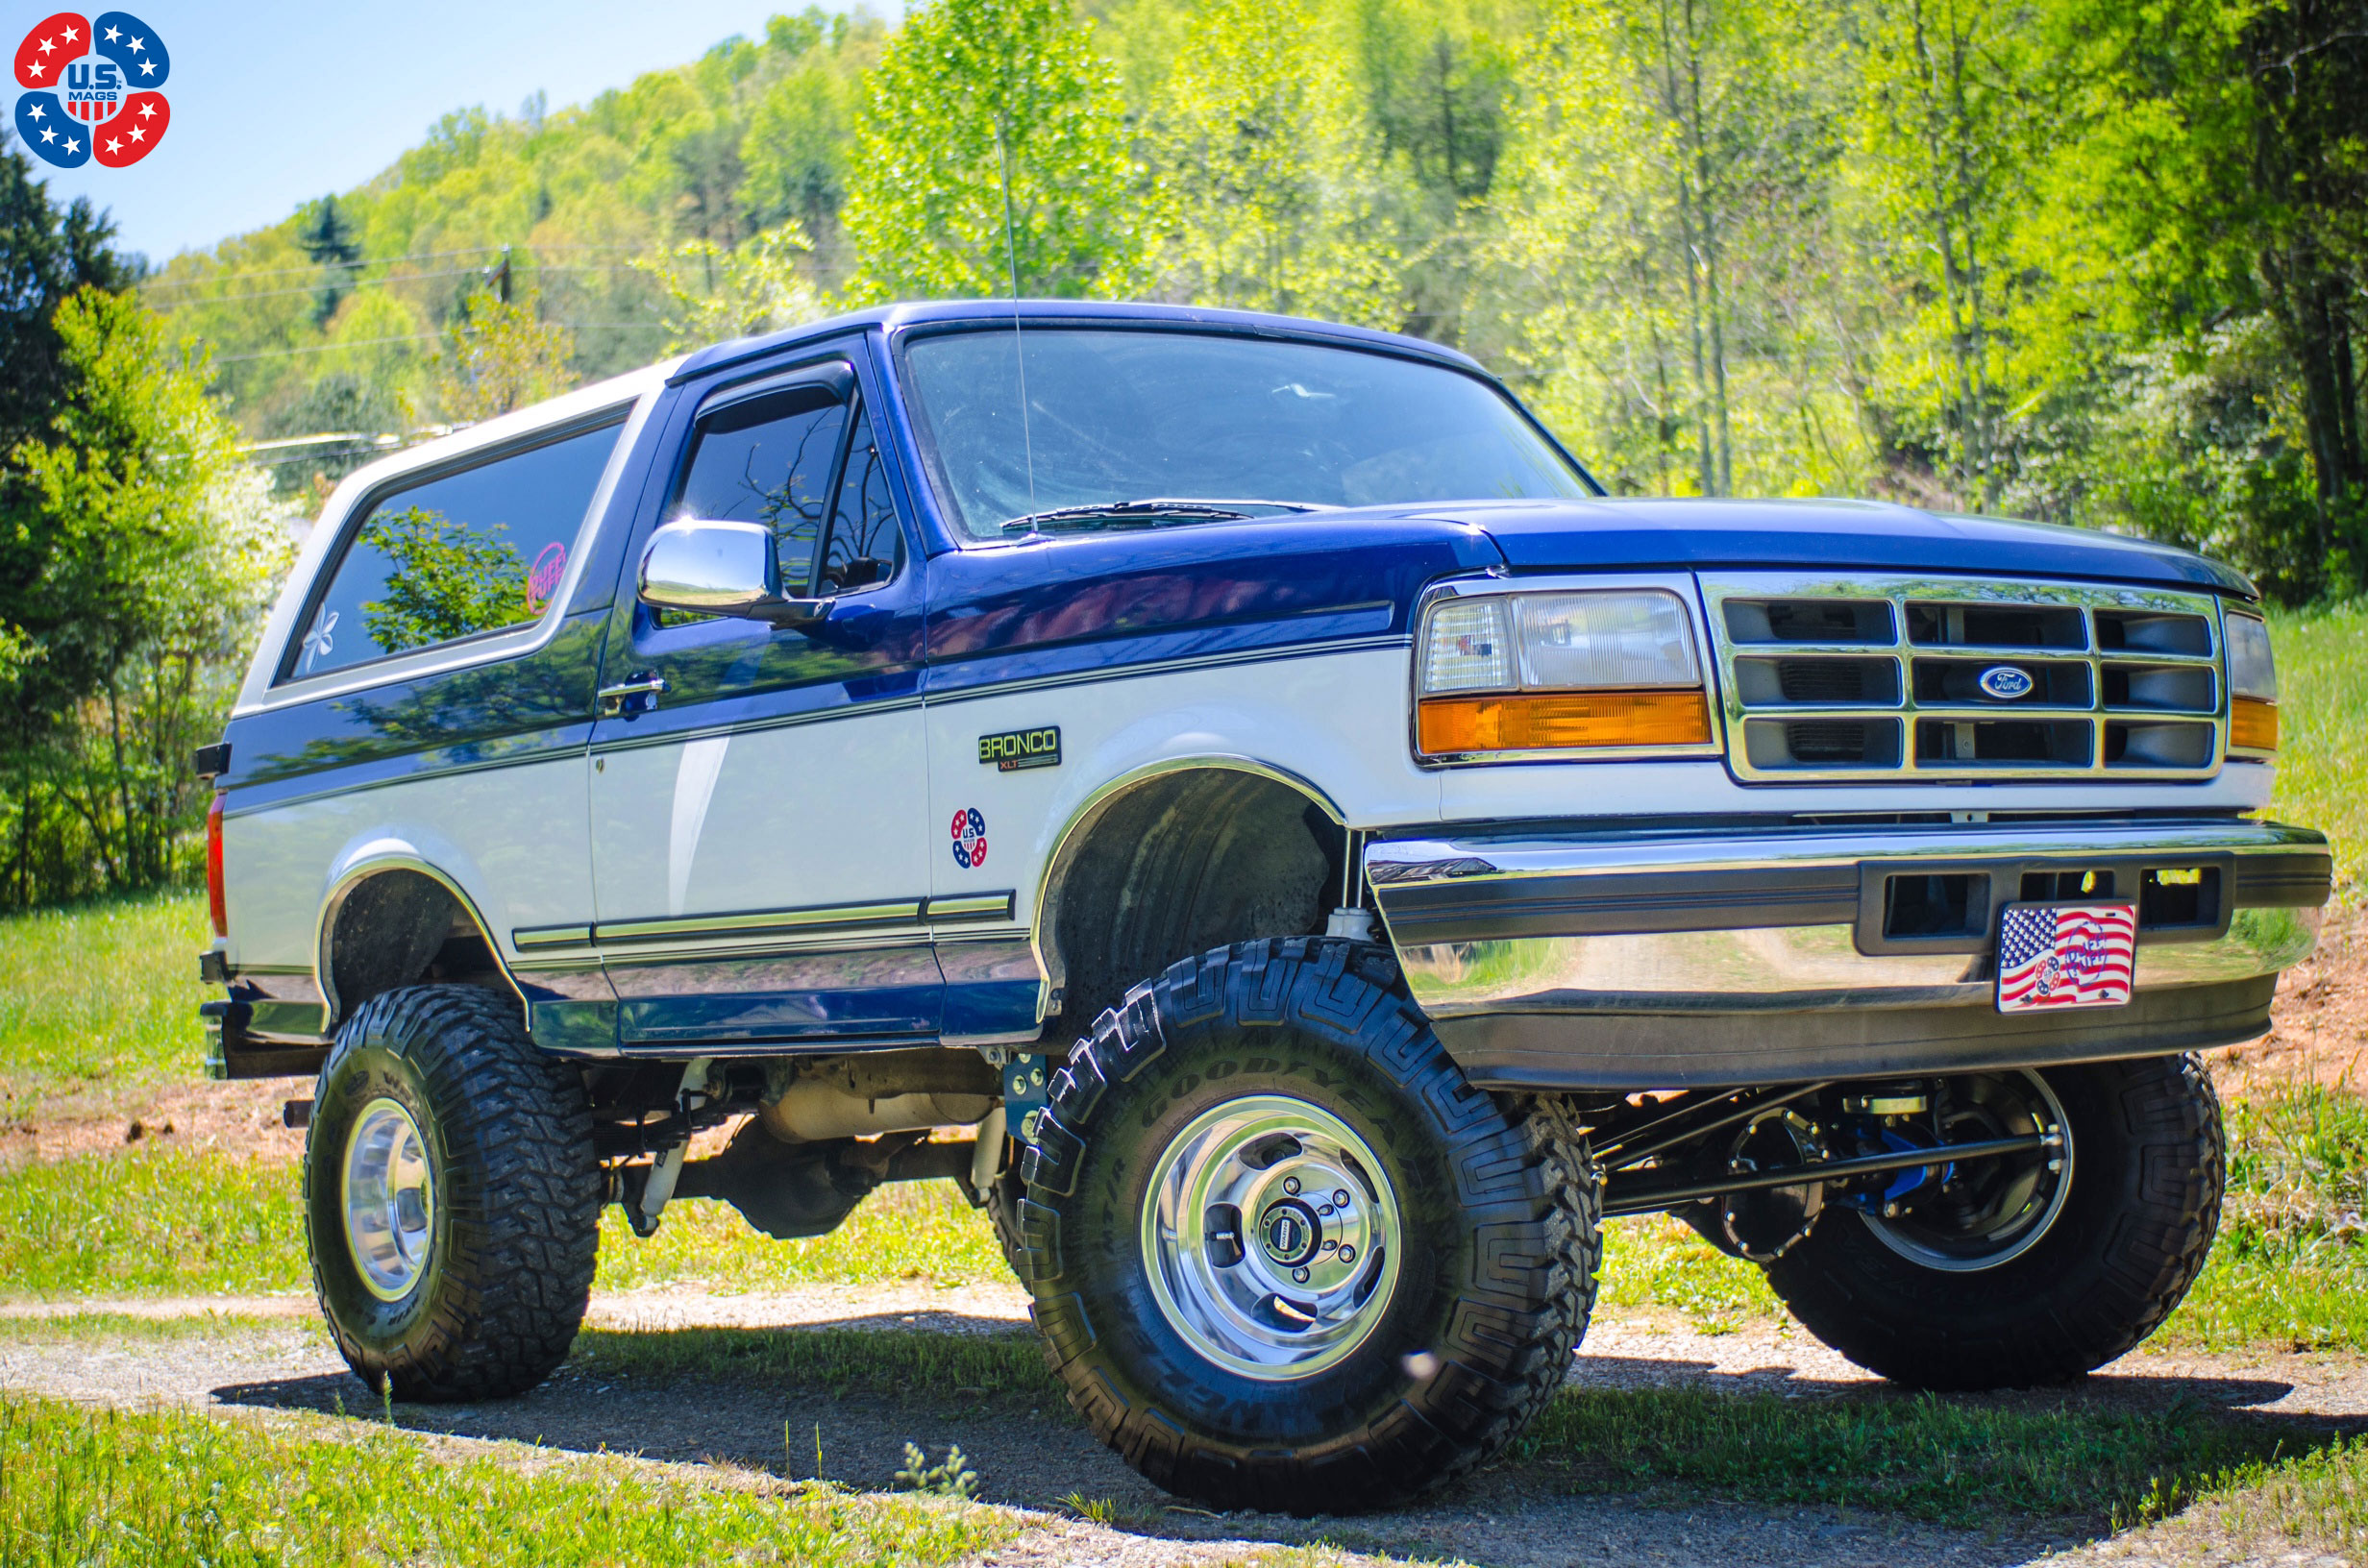 Ford Bronco Indy - U101 Truck Gallery - MHT Wheels Inc.